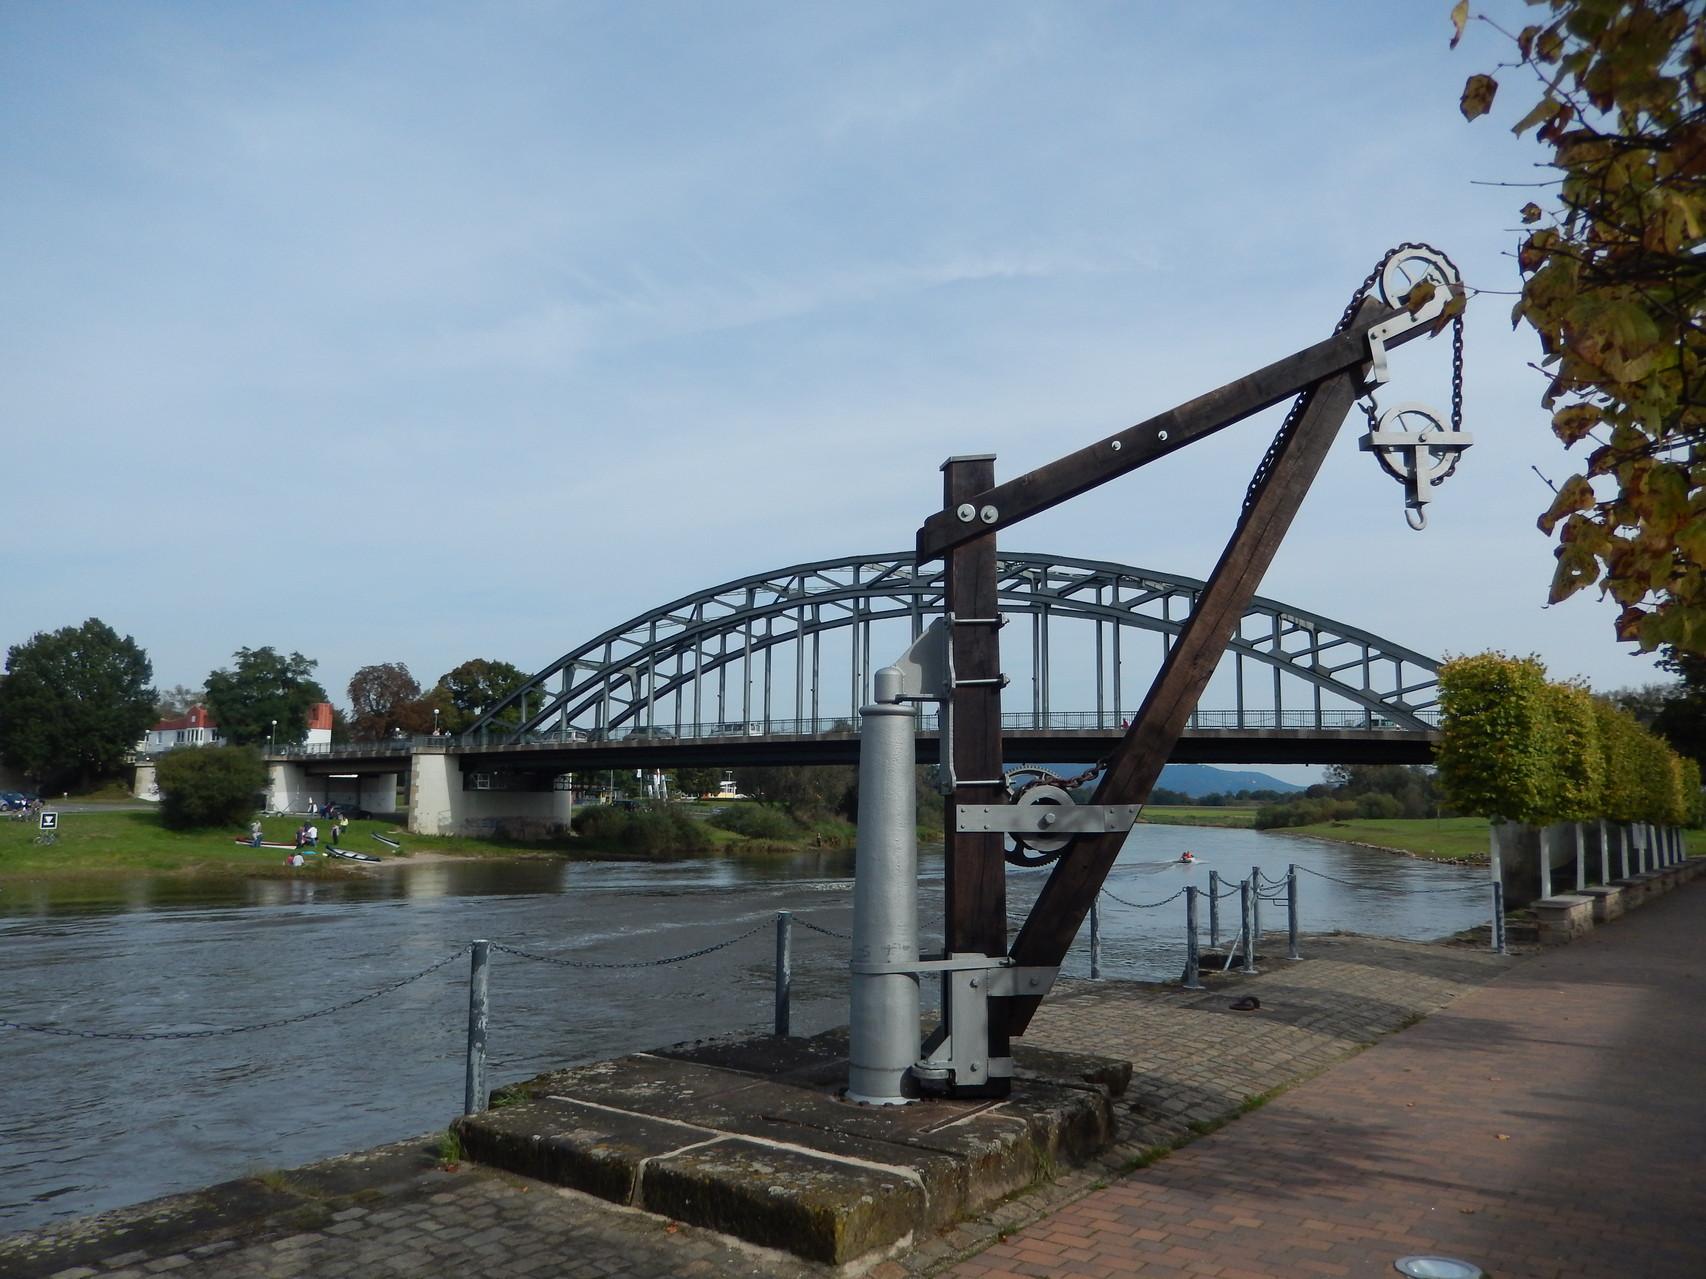 Hindenburgbrücke in Rinteln